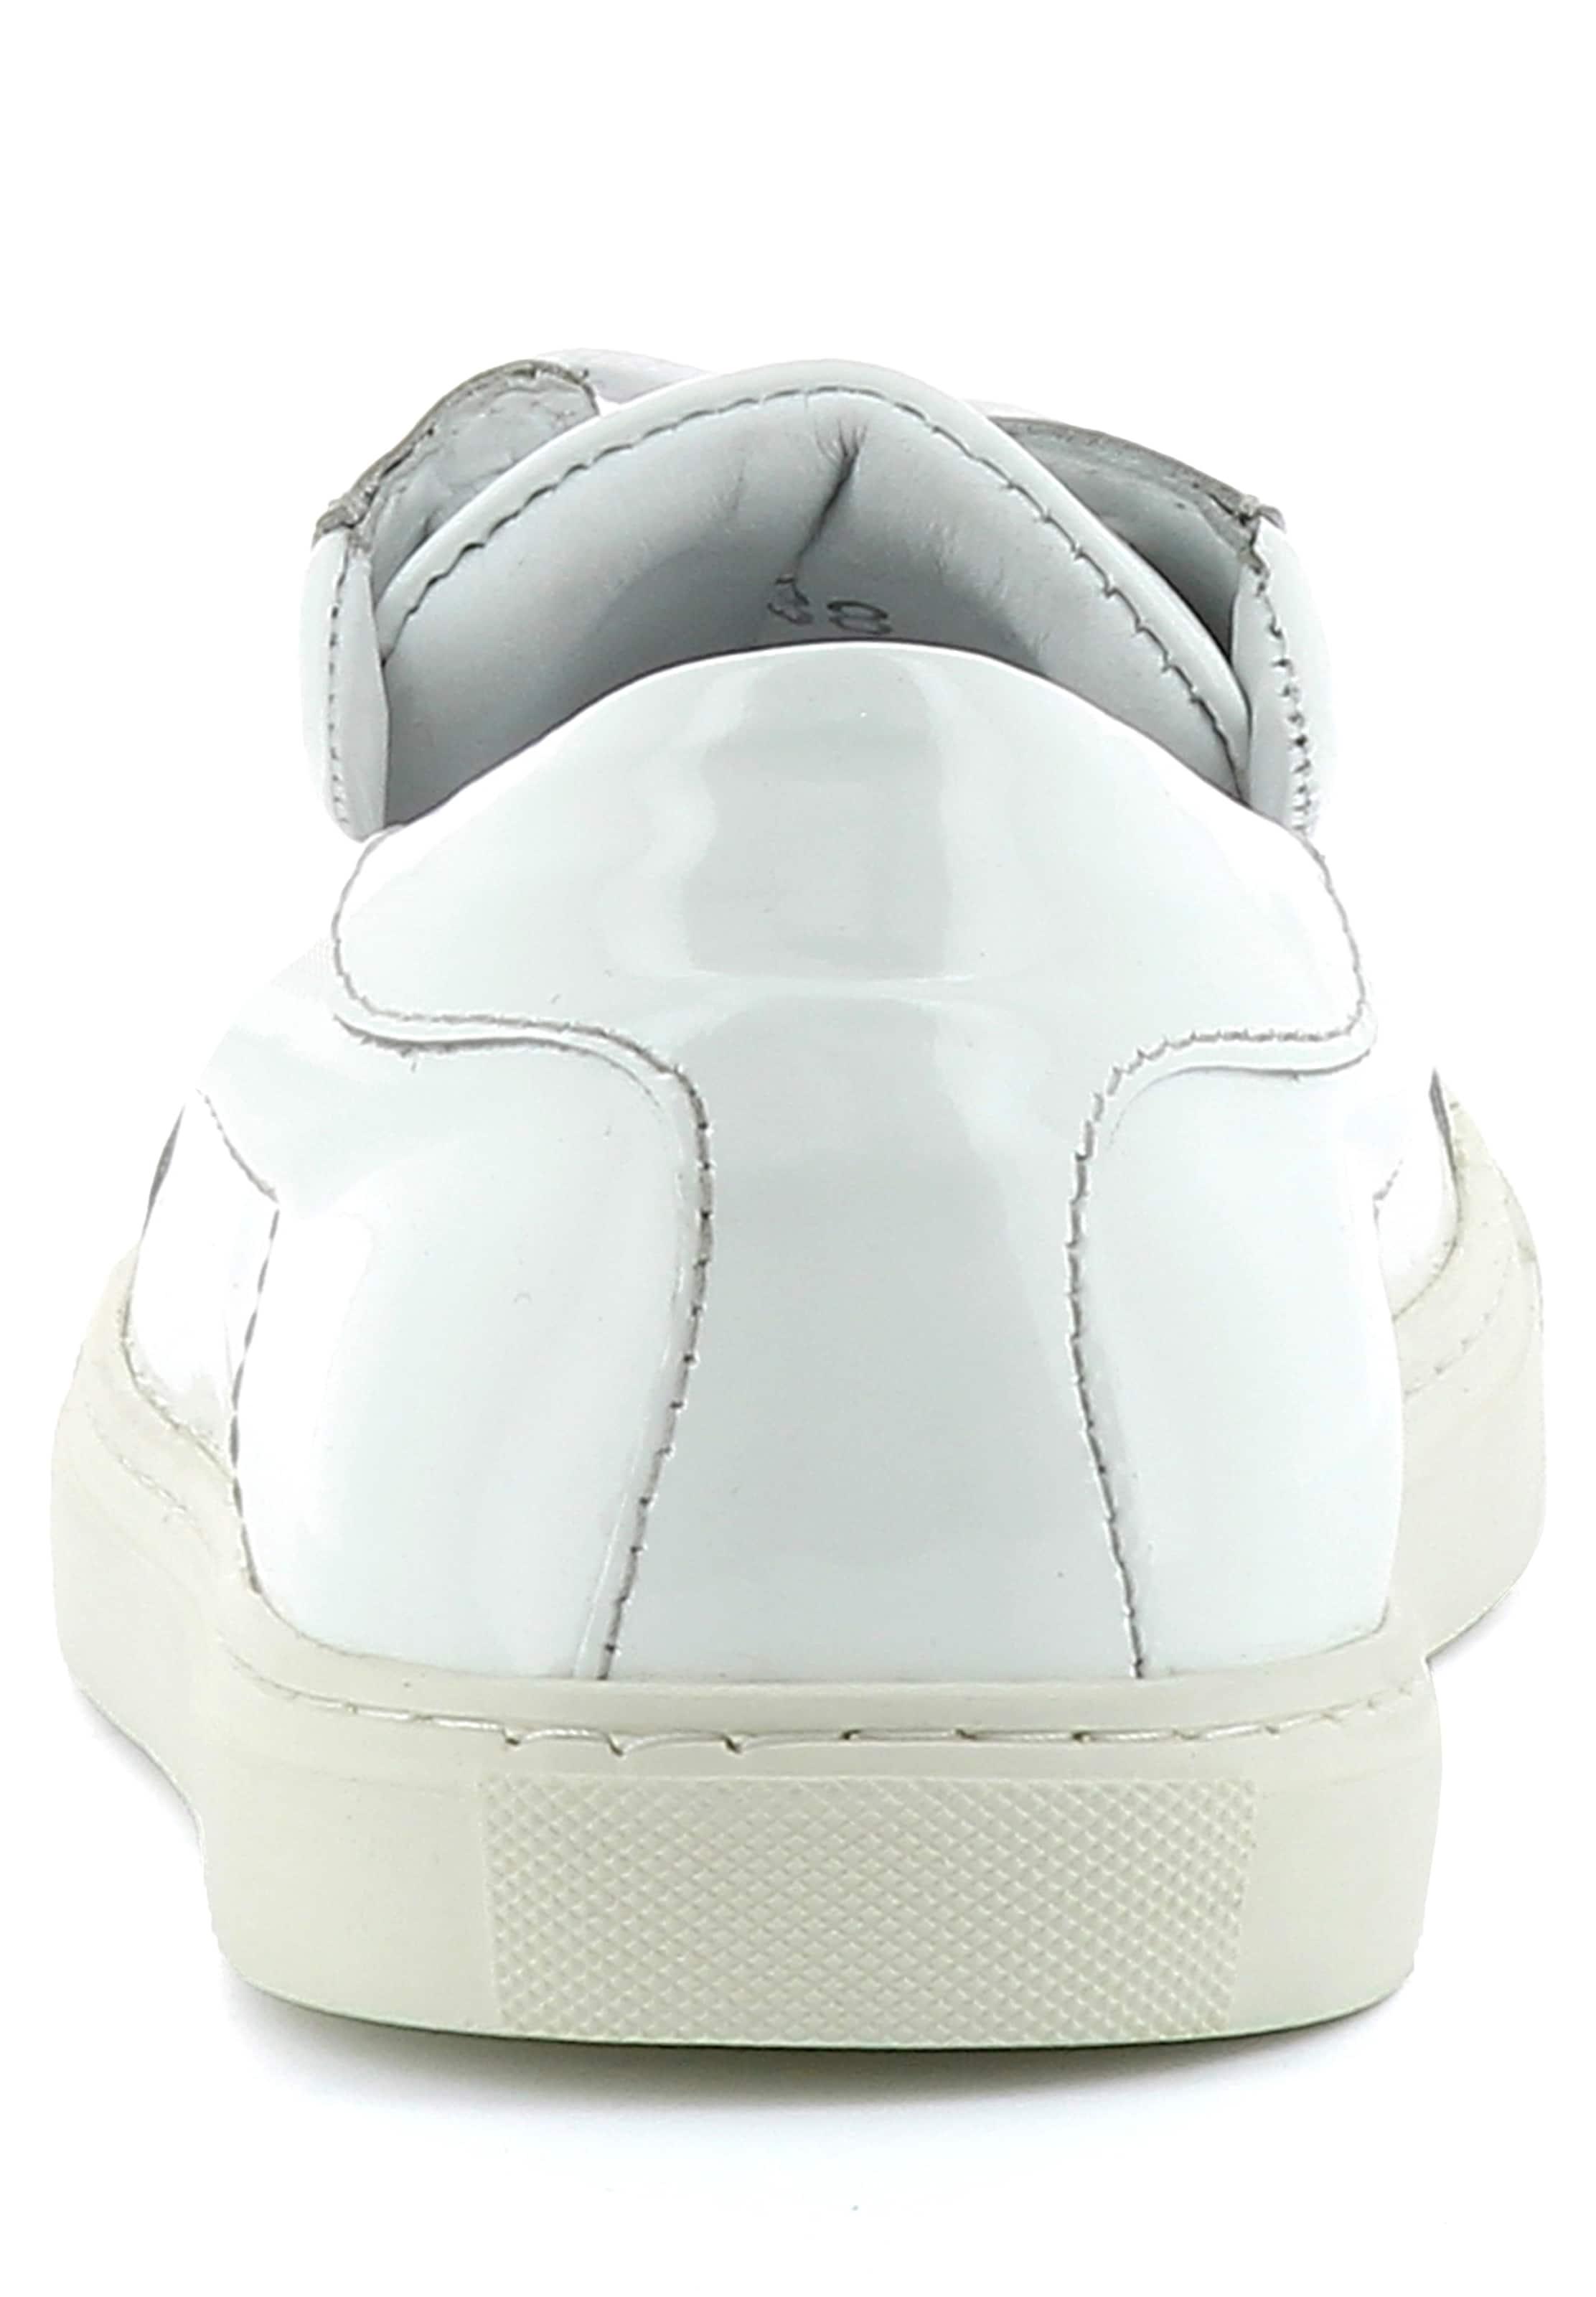 Sneaker Weiß Damen In Evita Marisa rQxBECoeWd